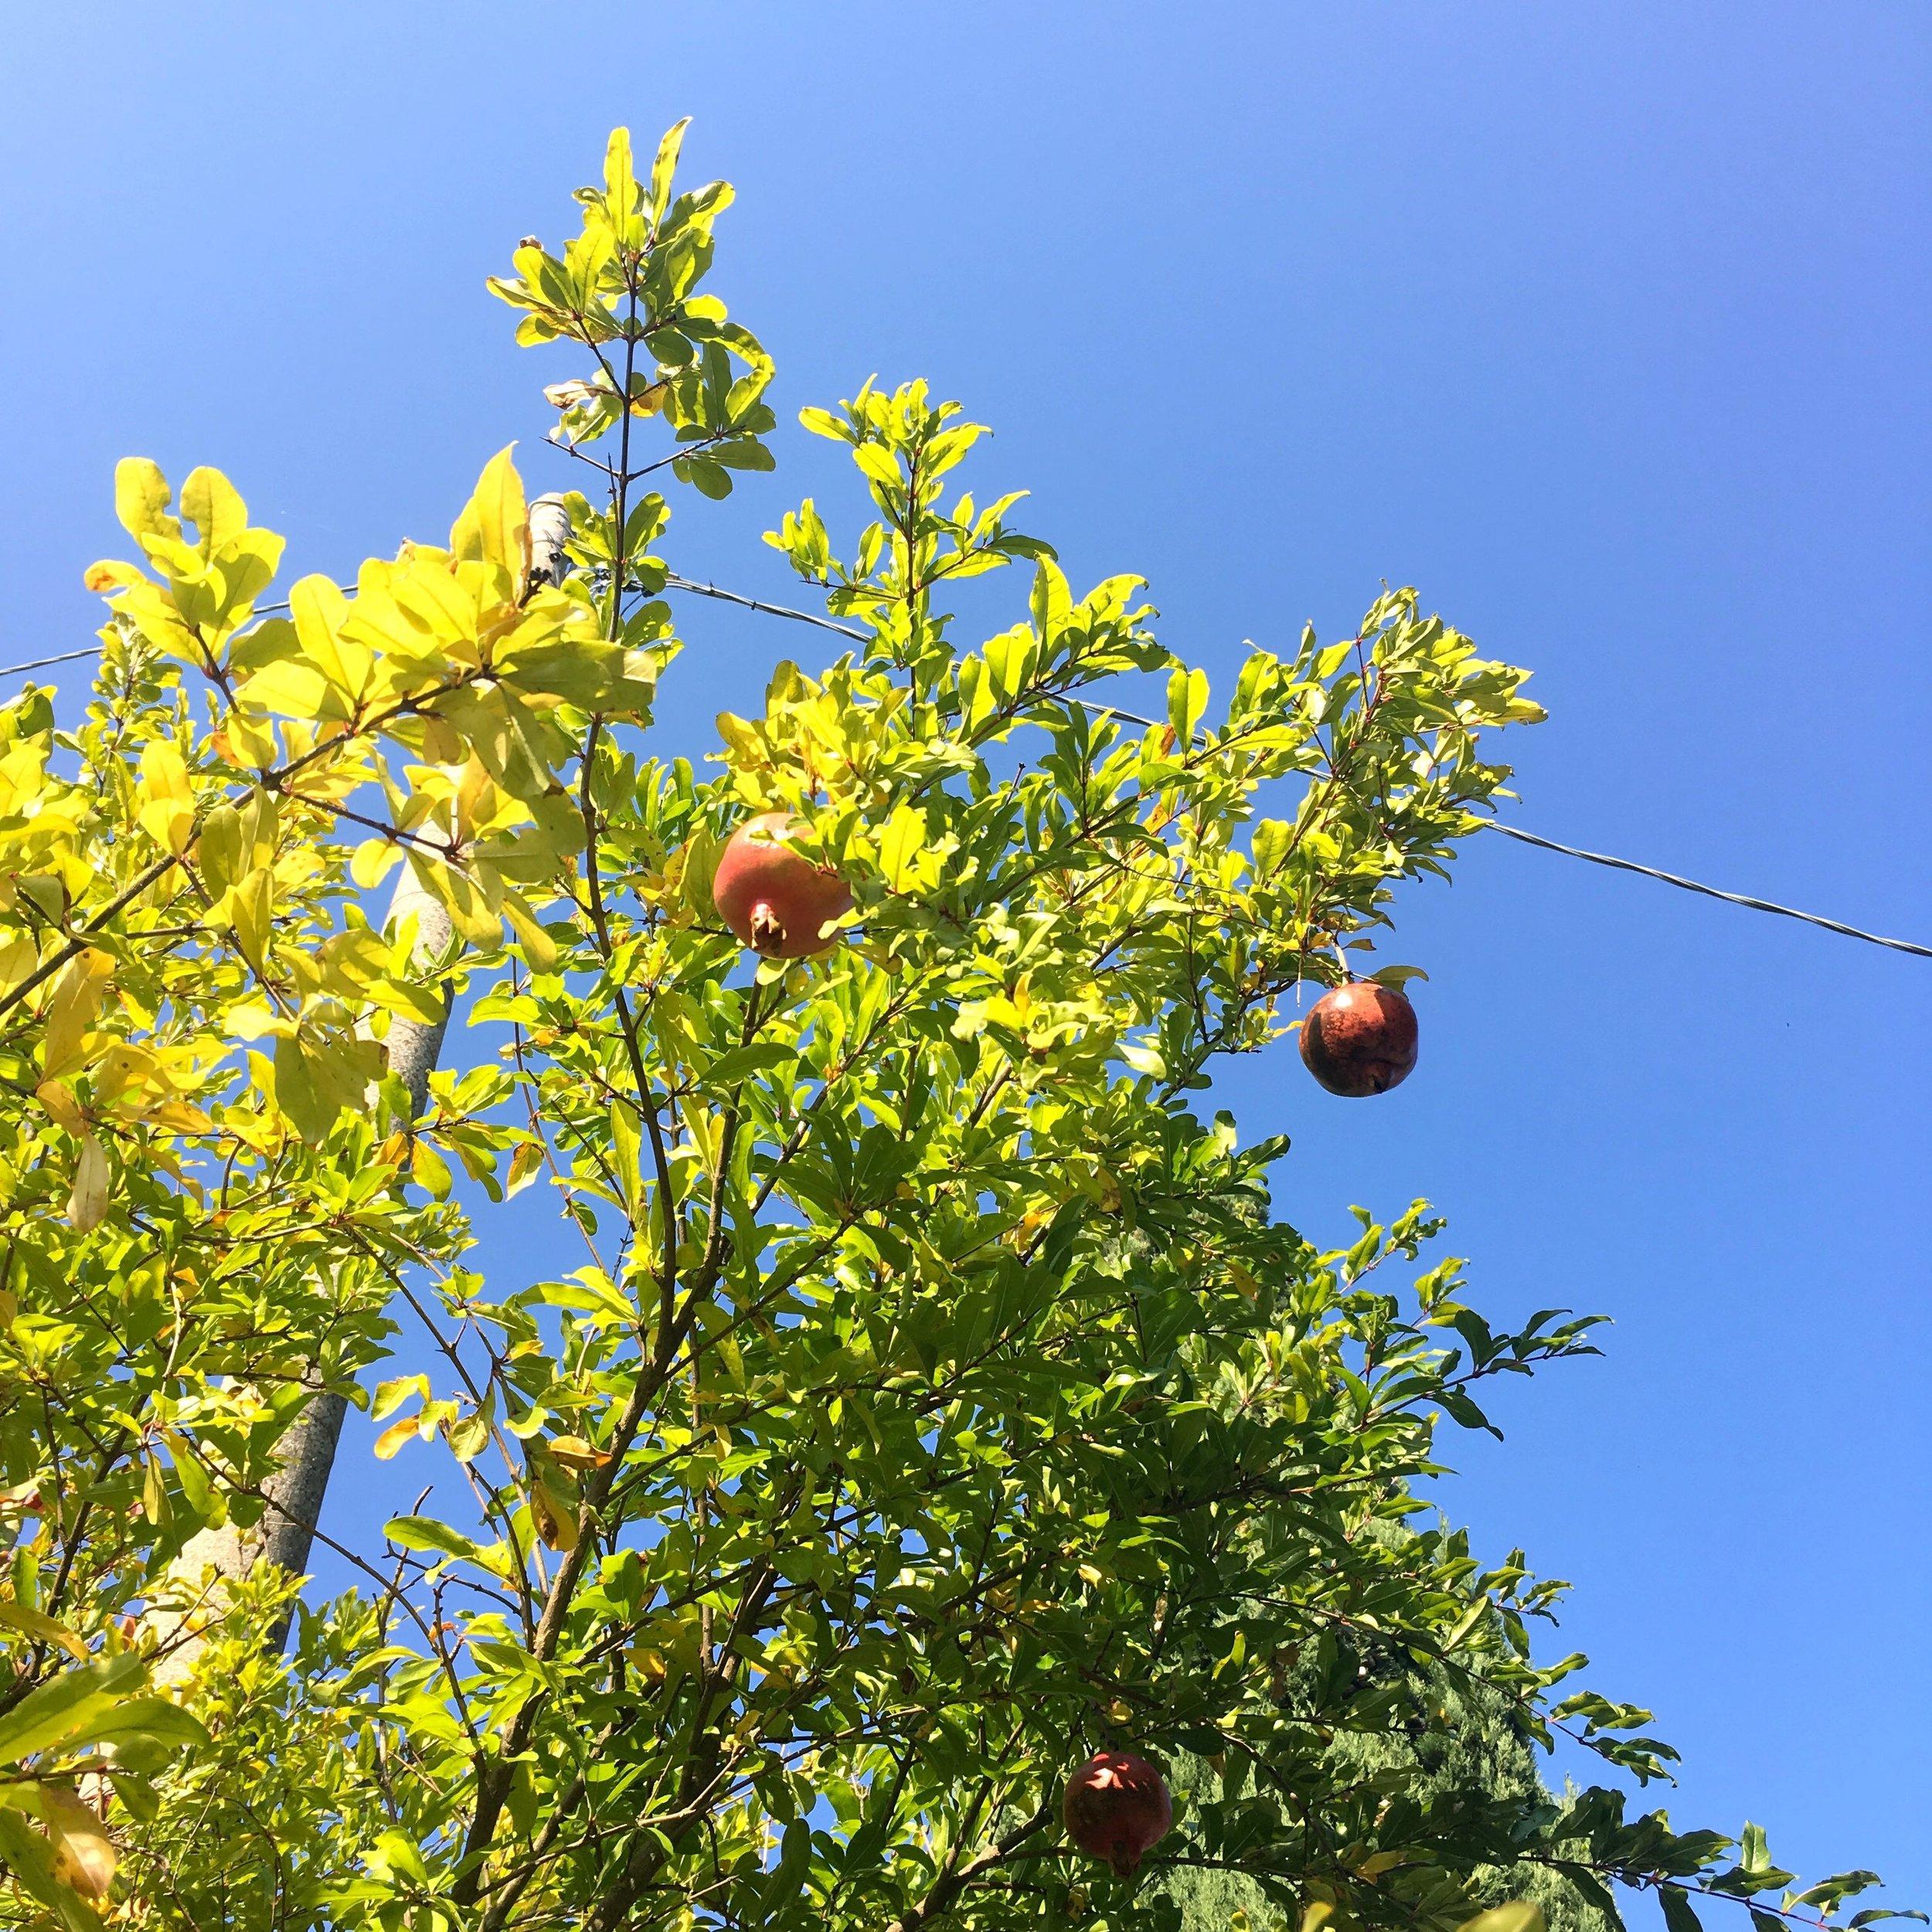 pomegranates growing in the Italian gardens